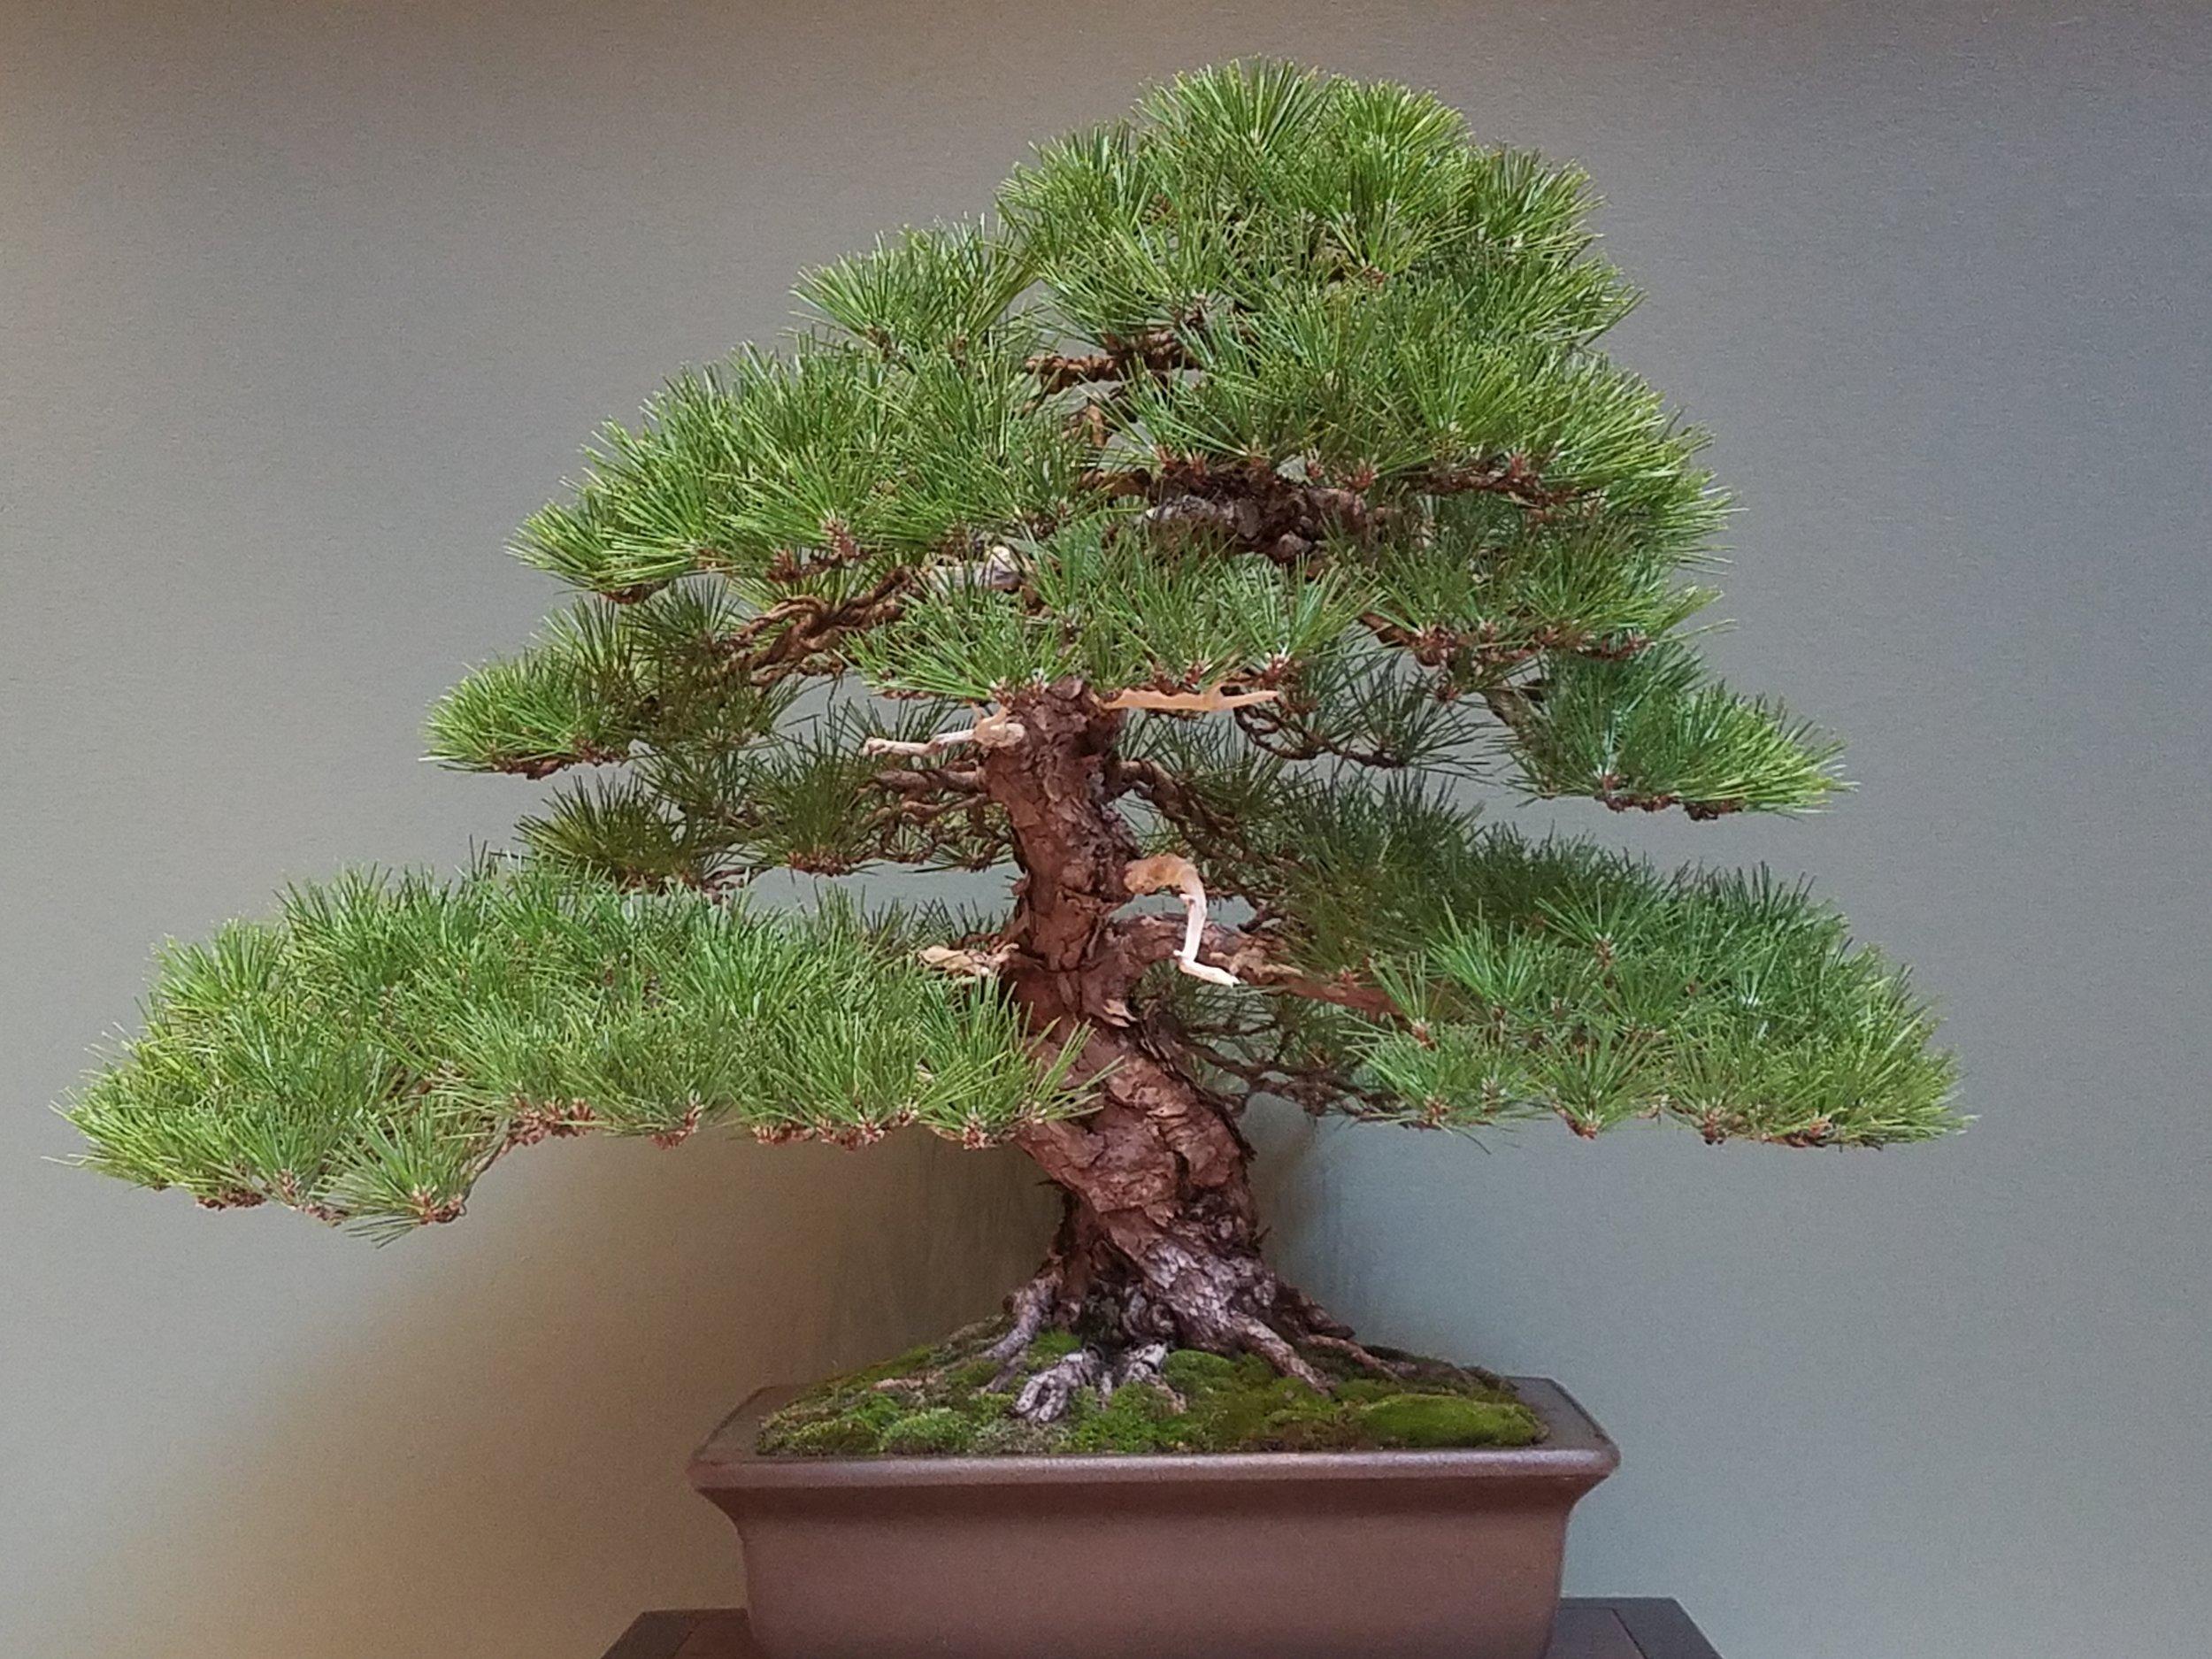 2017 Mid-America Bonsai Exhibition - Japanese Black Pine - Informal Upright